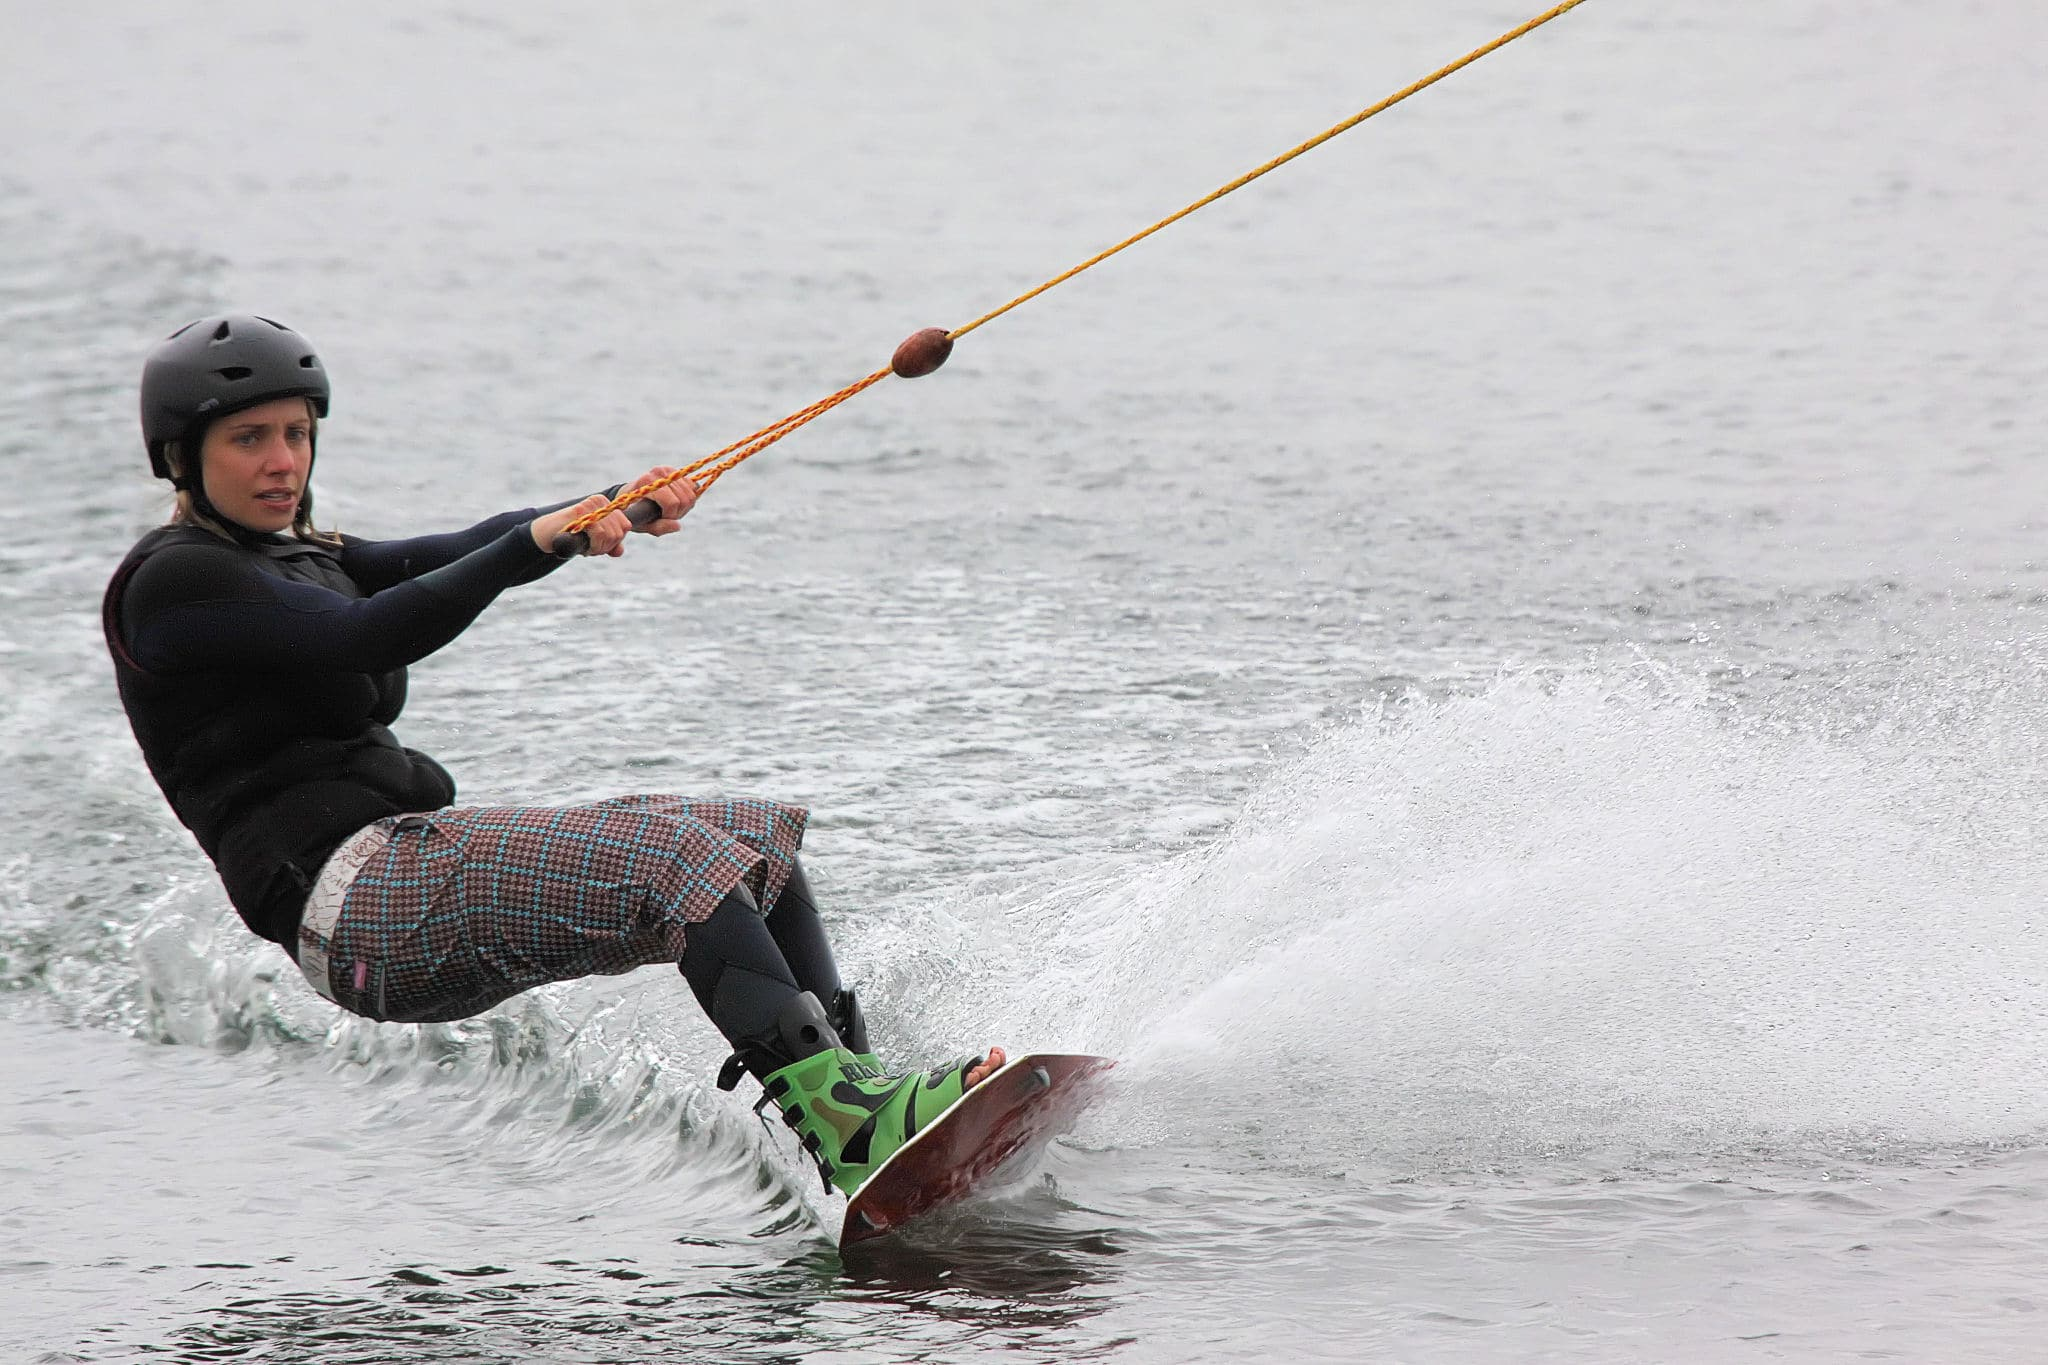 wakeboarding equipment